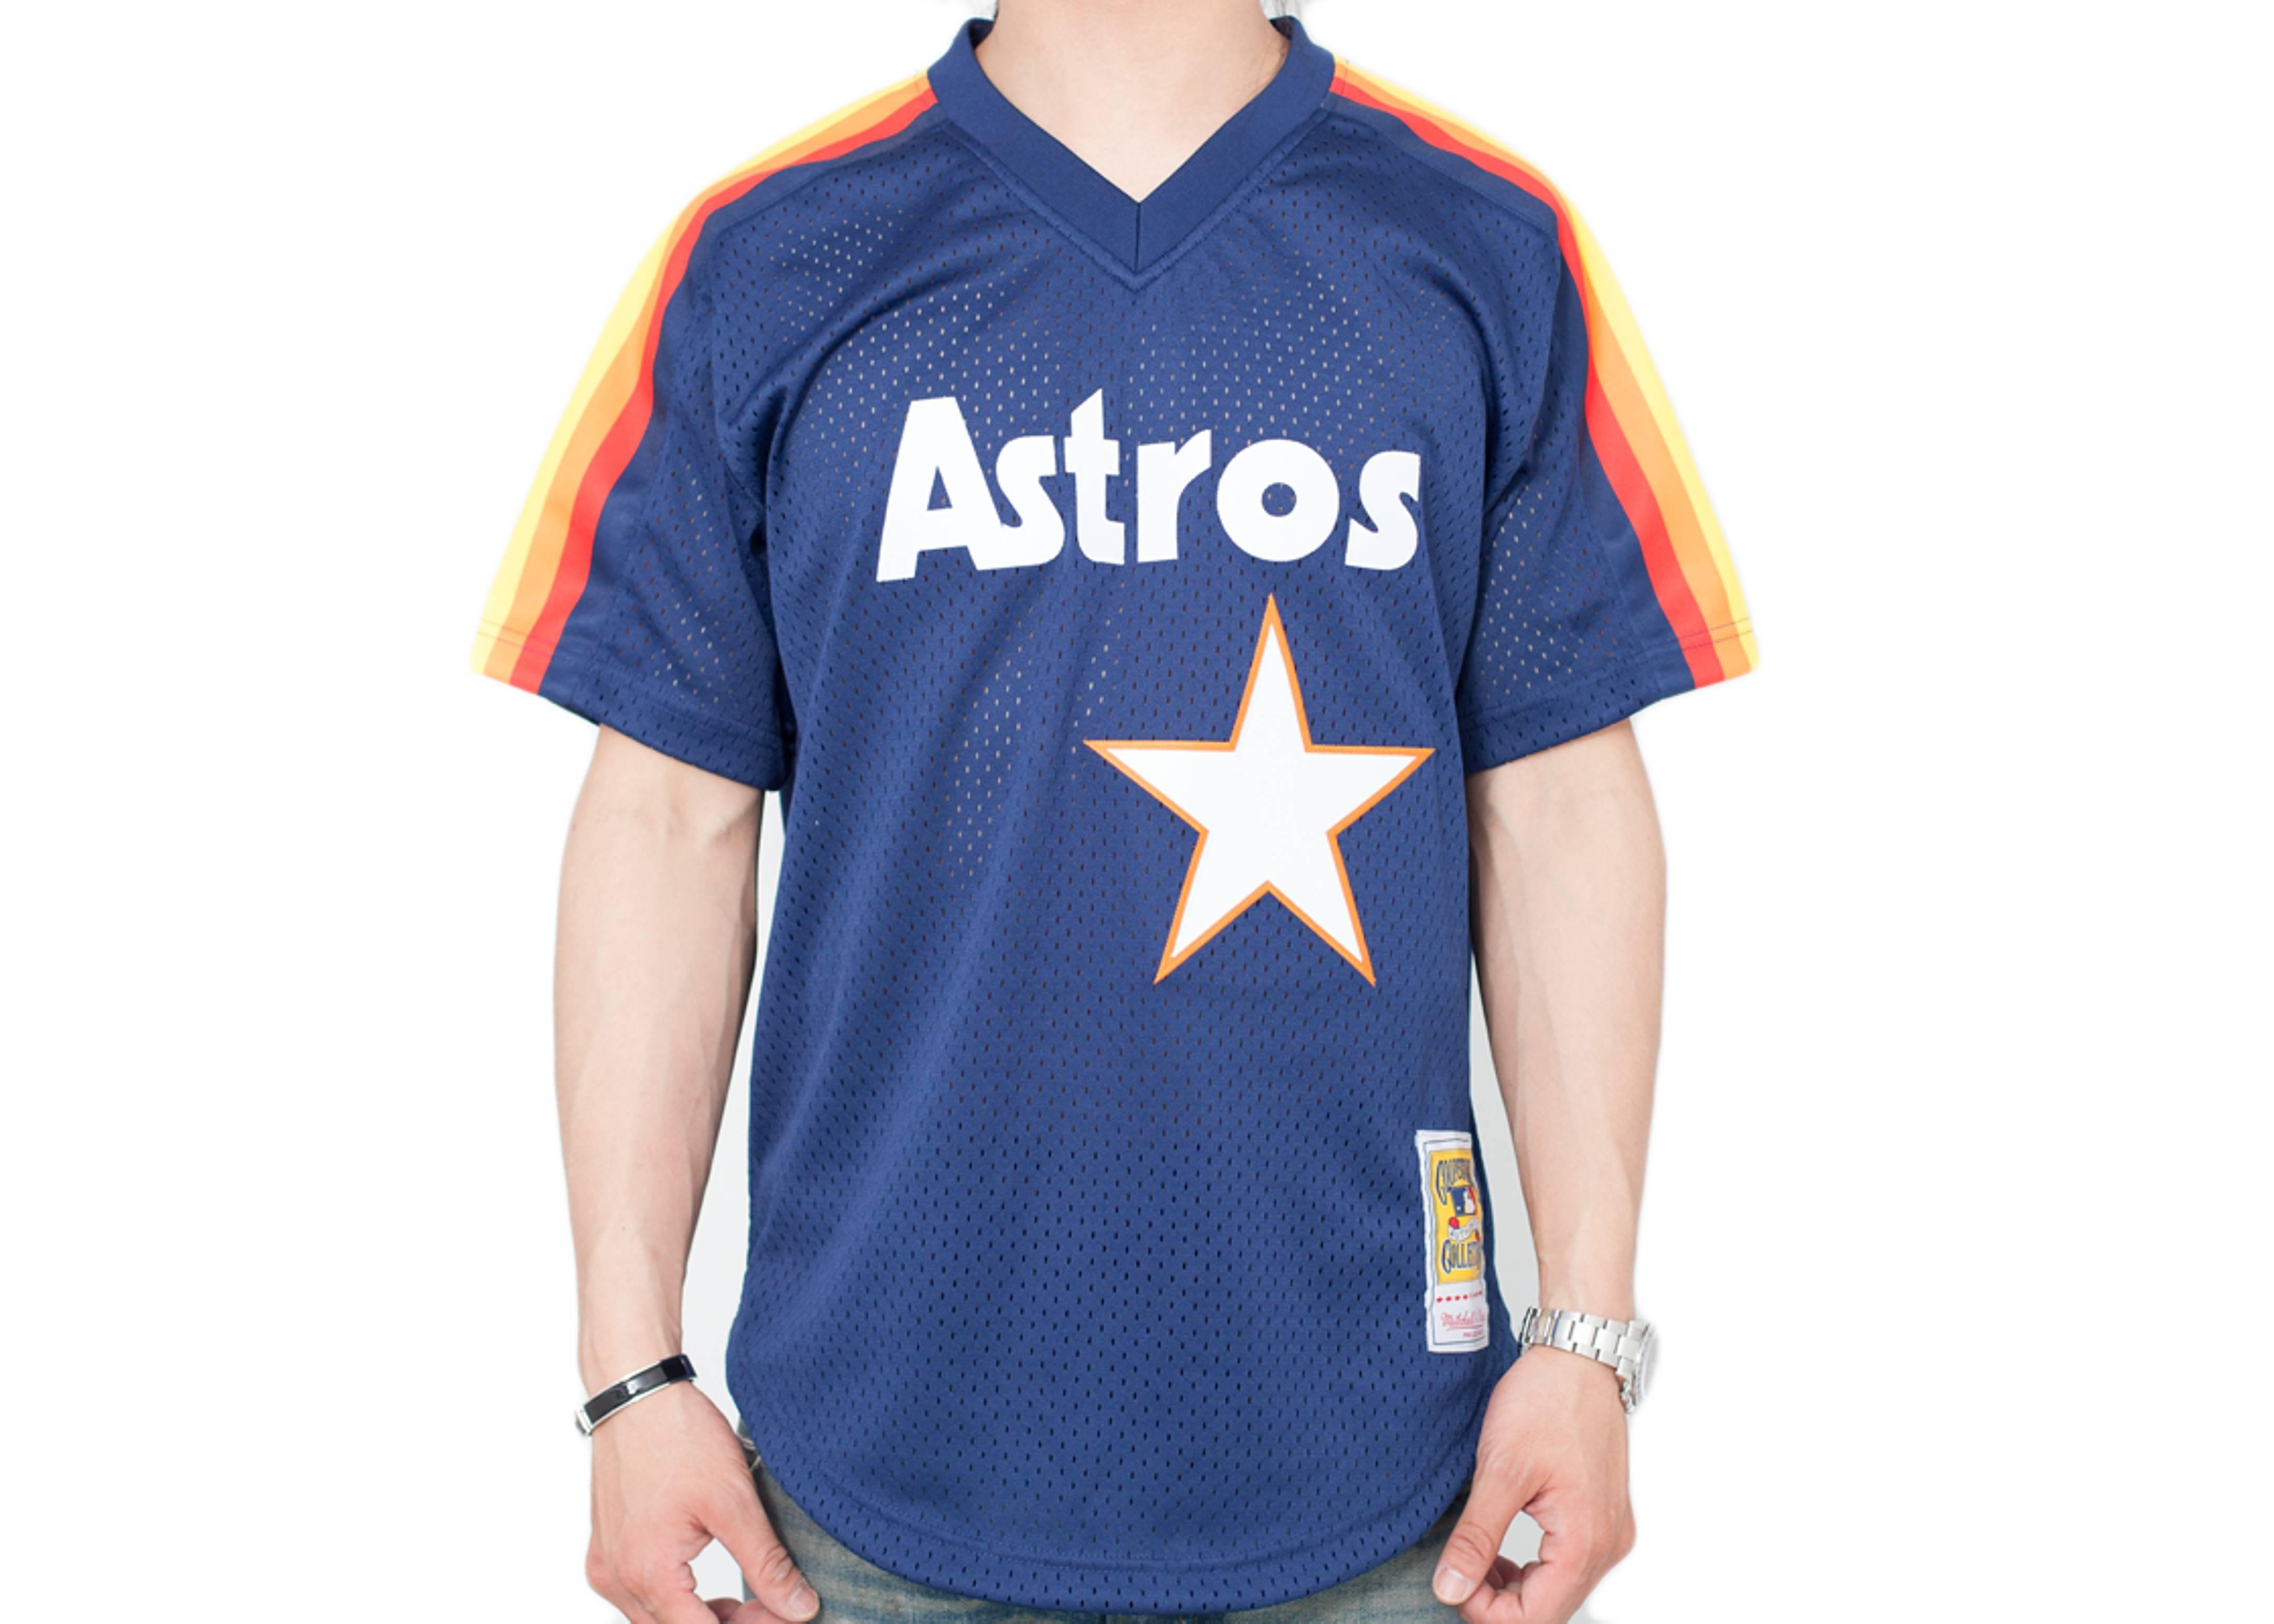 online retailer ad966 f62ca Houston Astros Authentic Mesh Bp Jersey